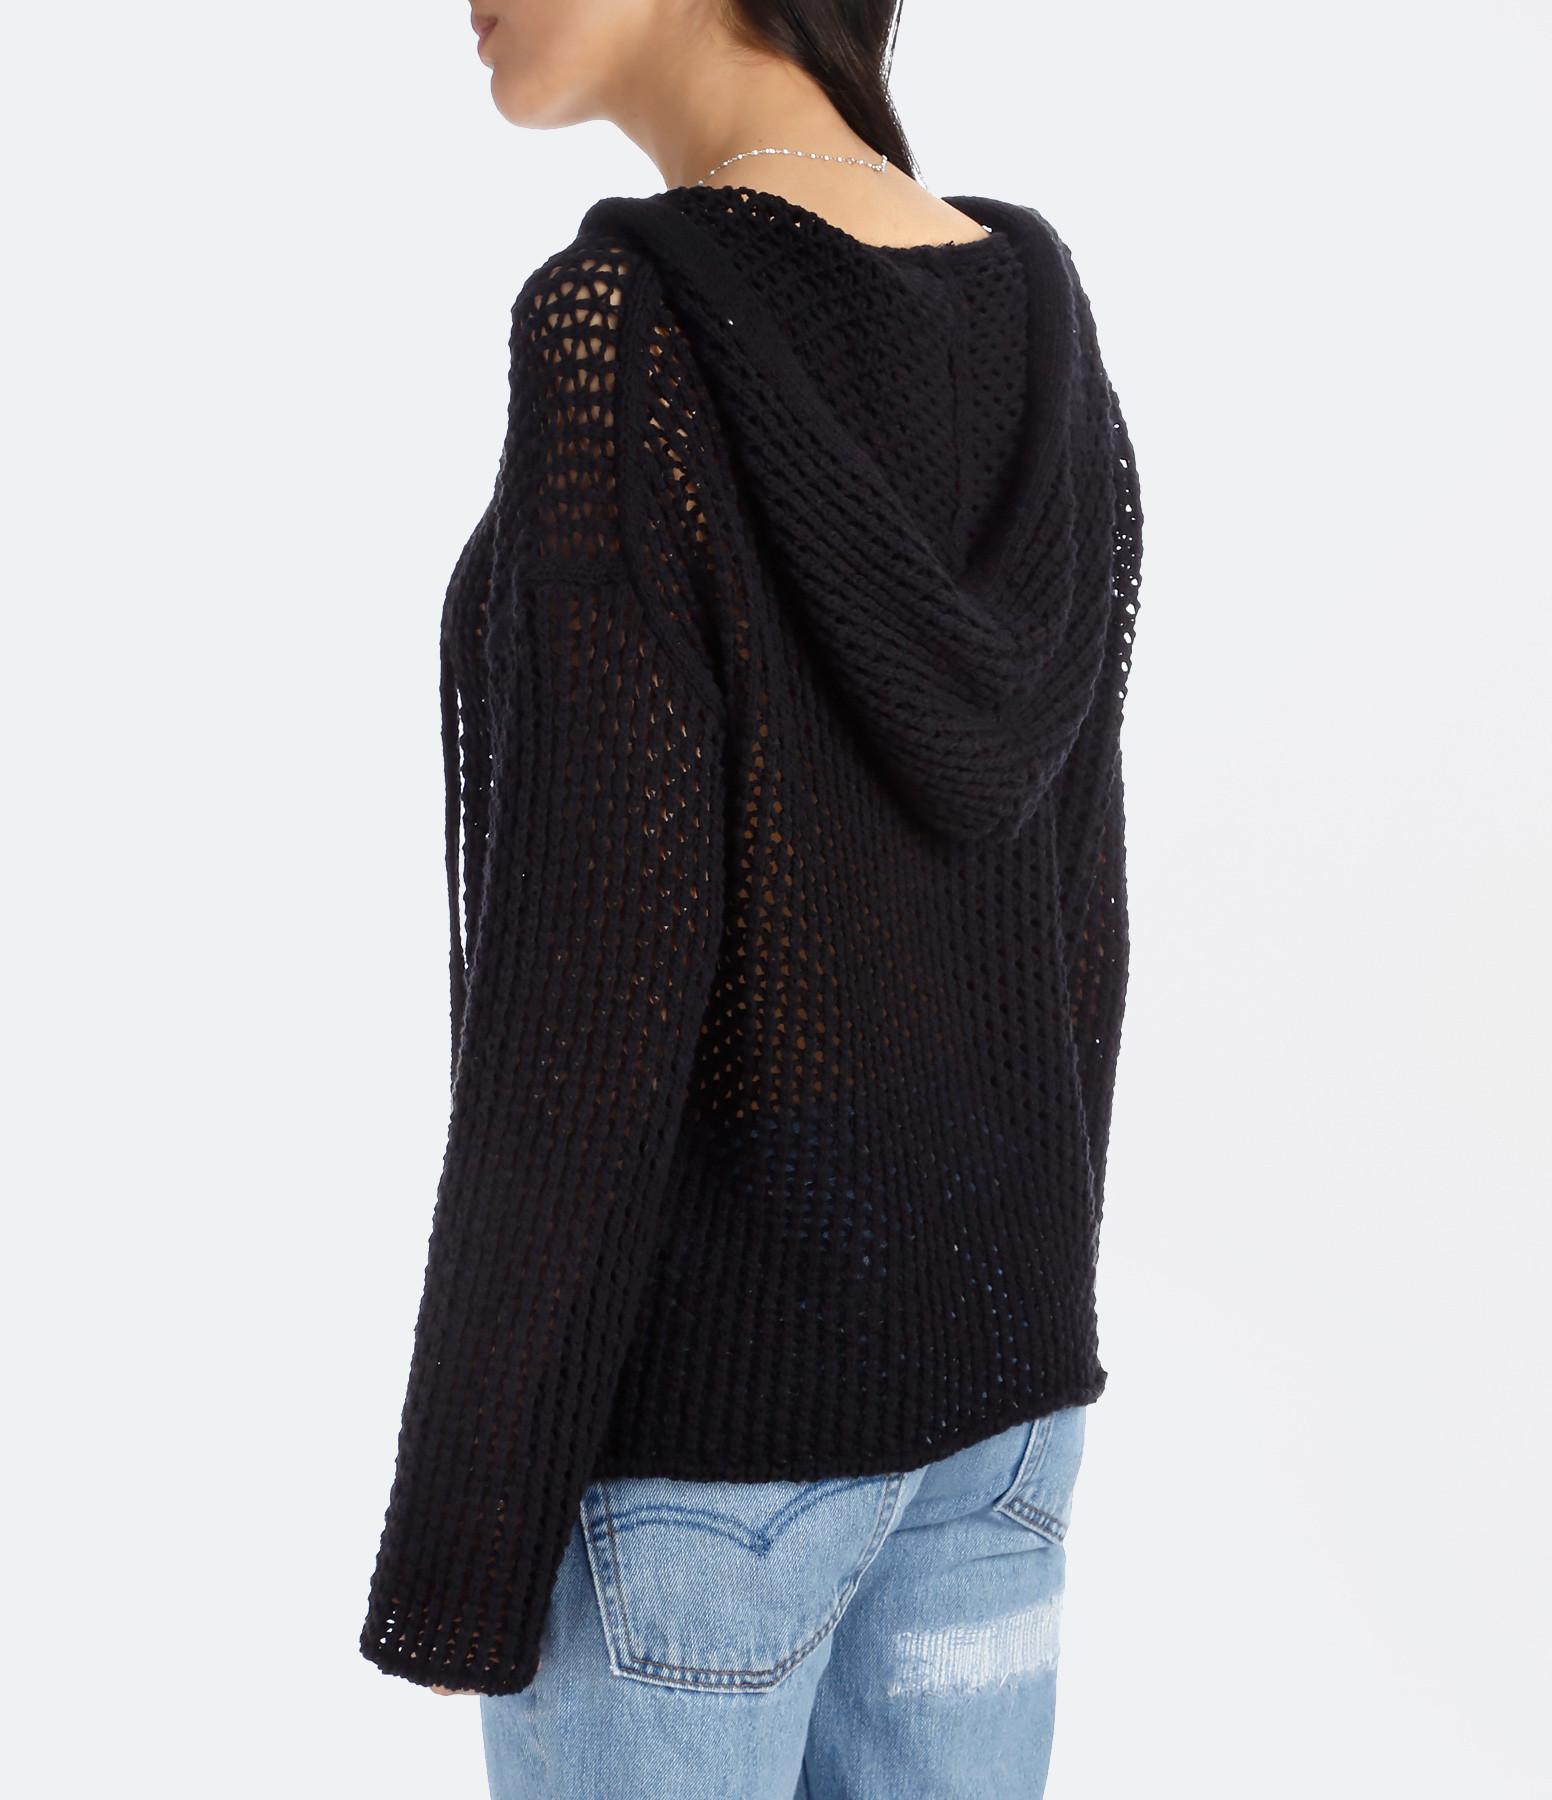 Pull Maisie Coton Lin Noir - NILI LOTAN